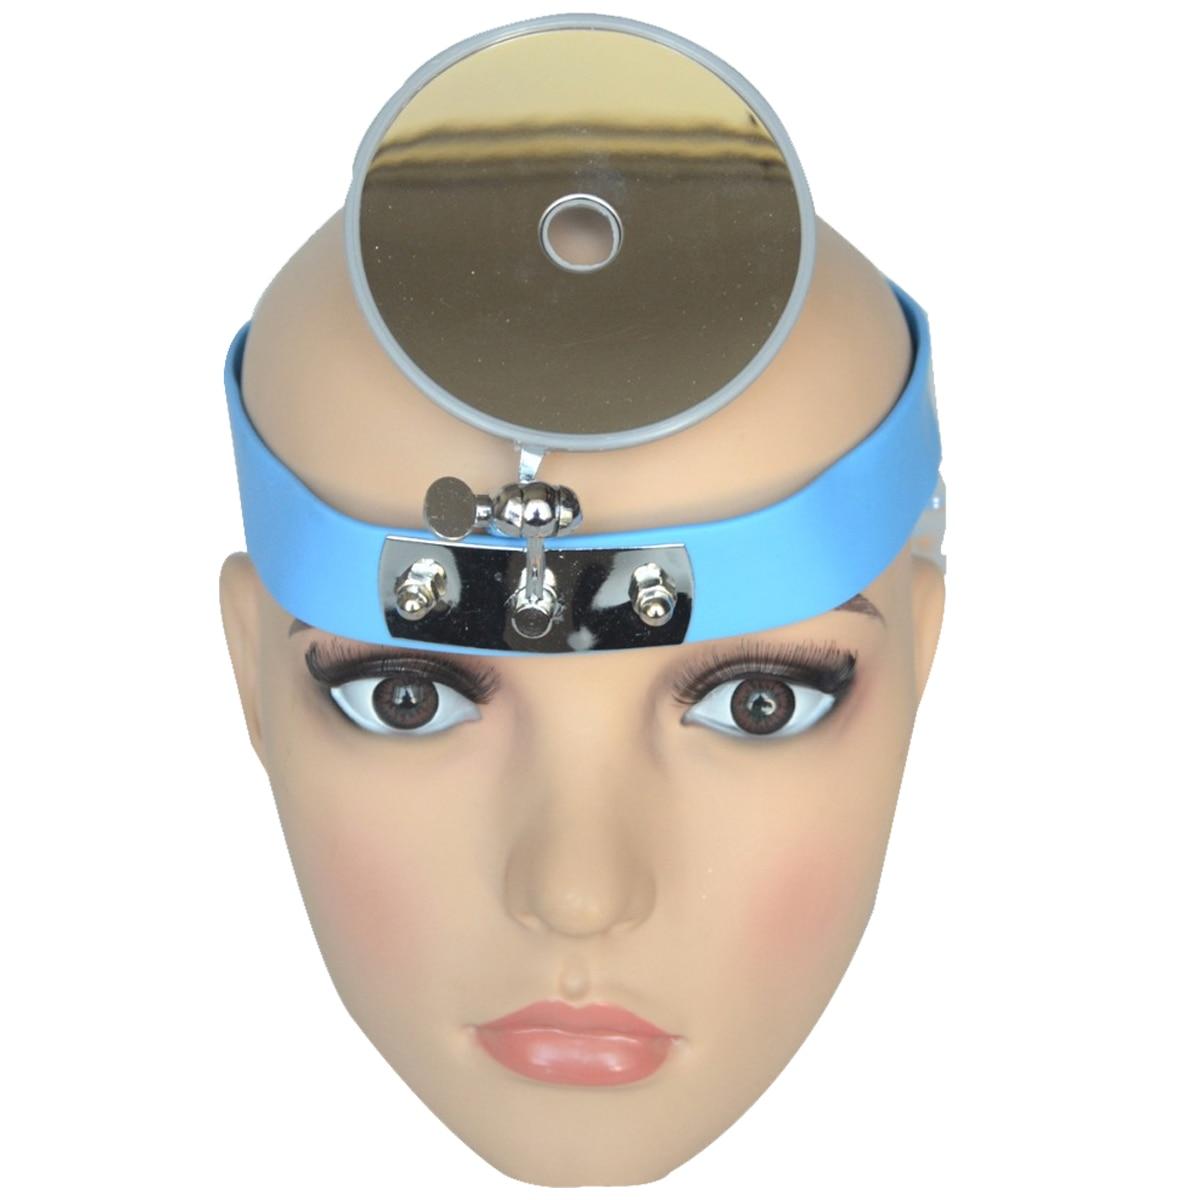 цена на The amount of medical mirror mirror ENT examination of medical endoscope otoscope medical devices